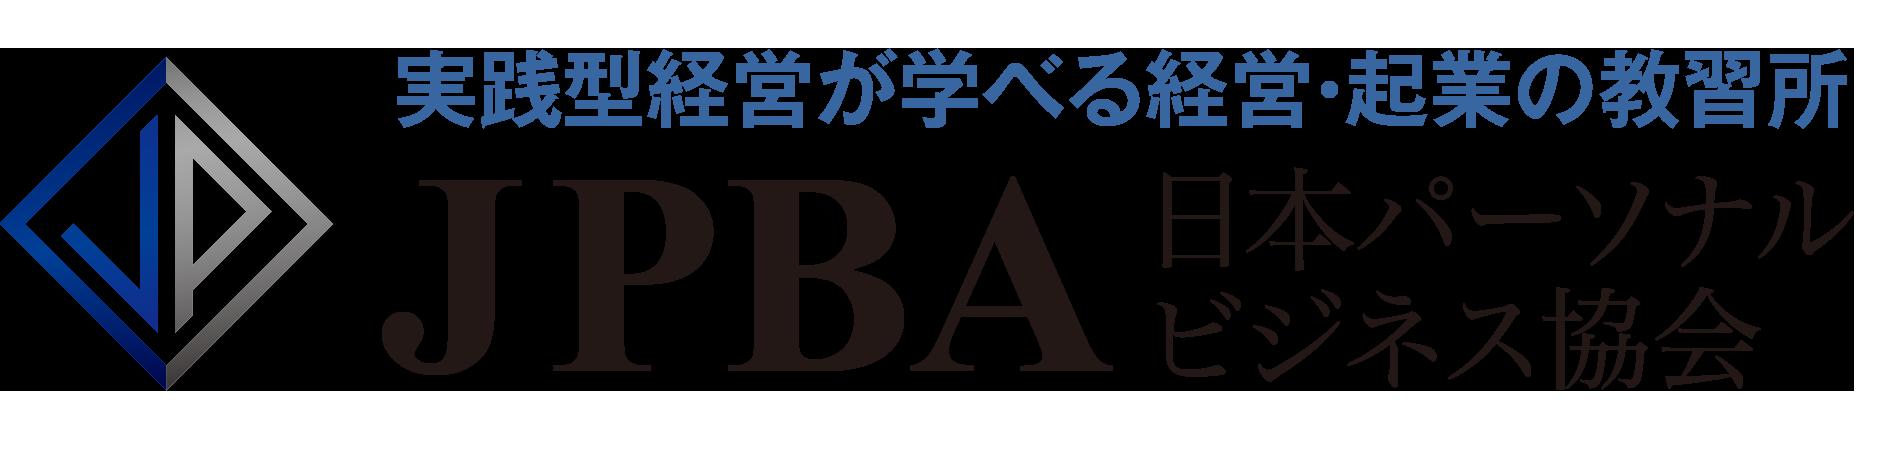 JPBA|一般社団法人 日本パーソナルビジネス協会|6か月で売上7倍の実績。会社・事業の経営力アップを支援!